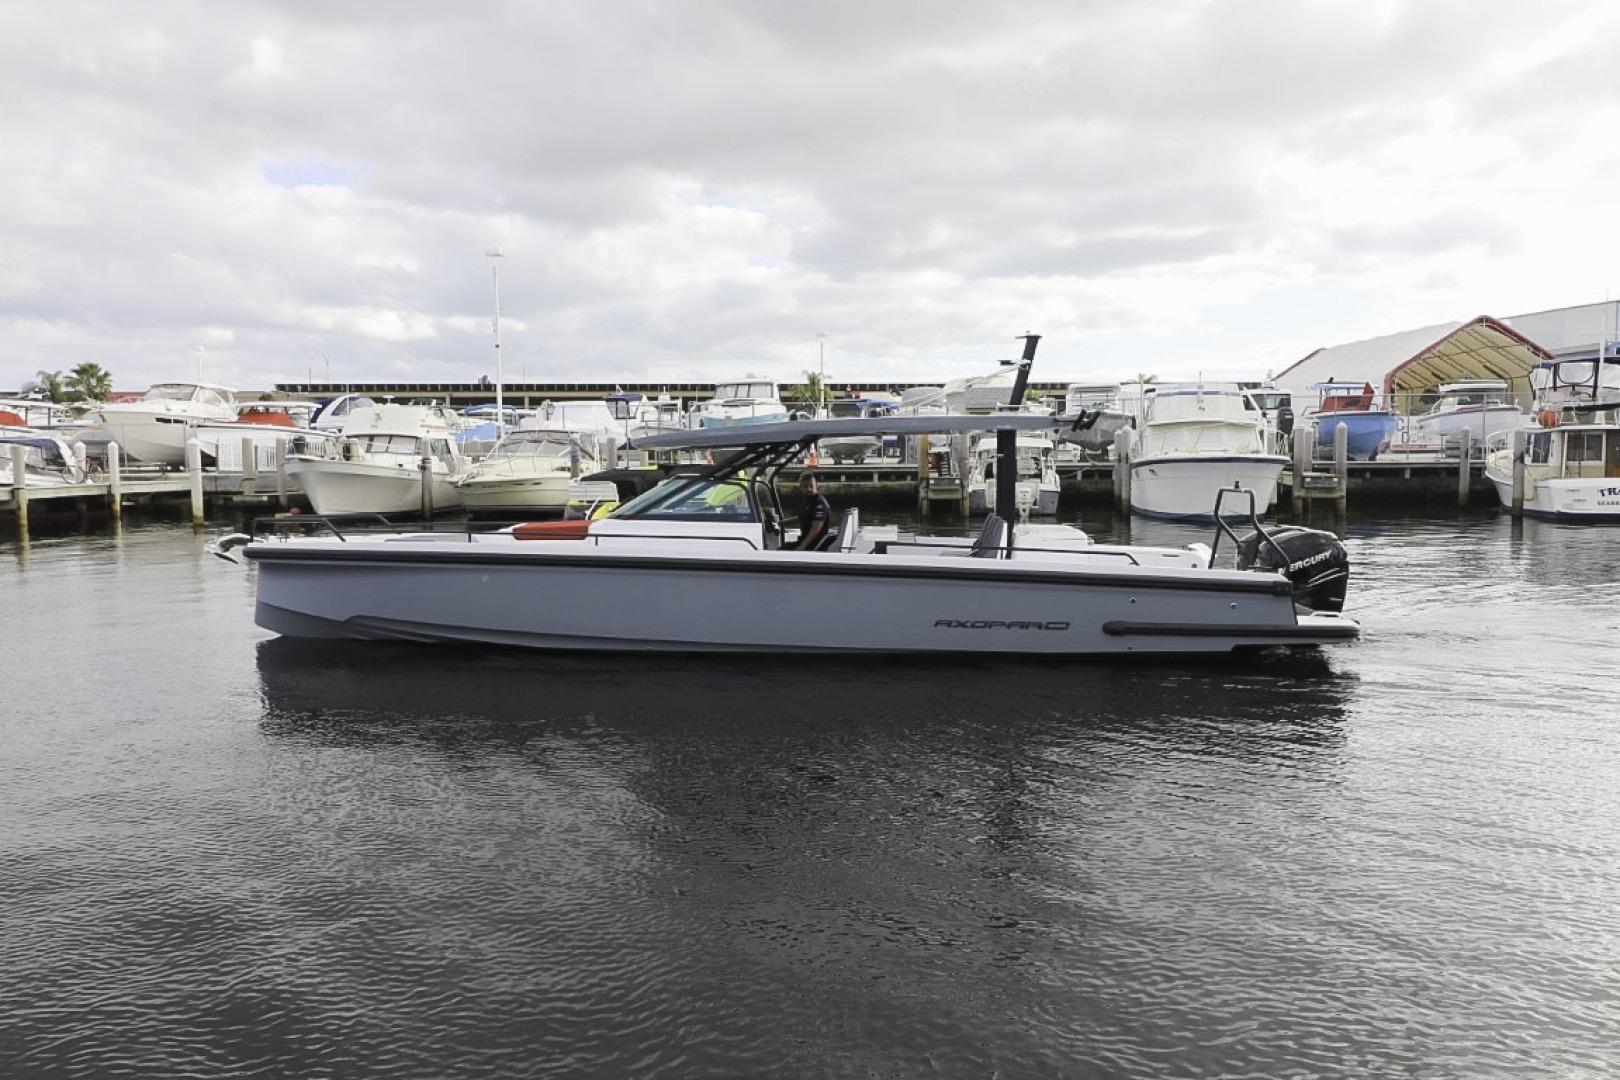 Axopar-37 Sun Top Revolution 2021 -Tampa Bay-Florida-United States-1580161 | Thumbnail